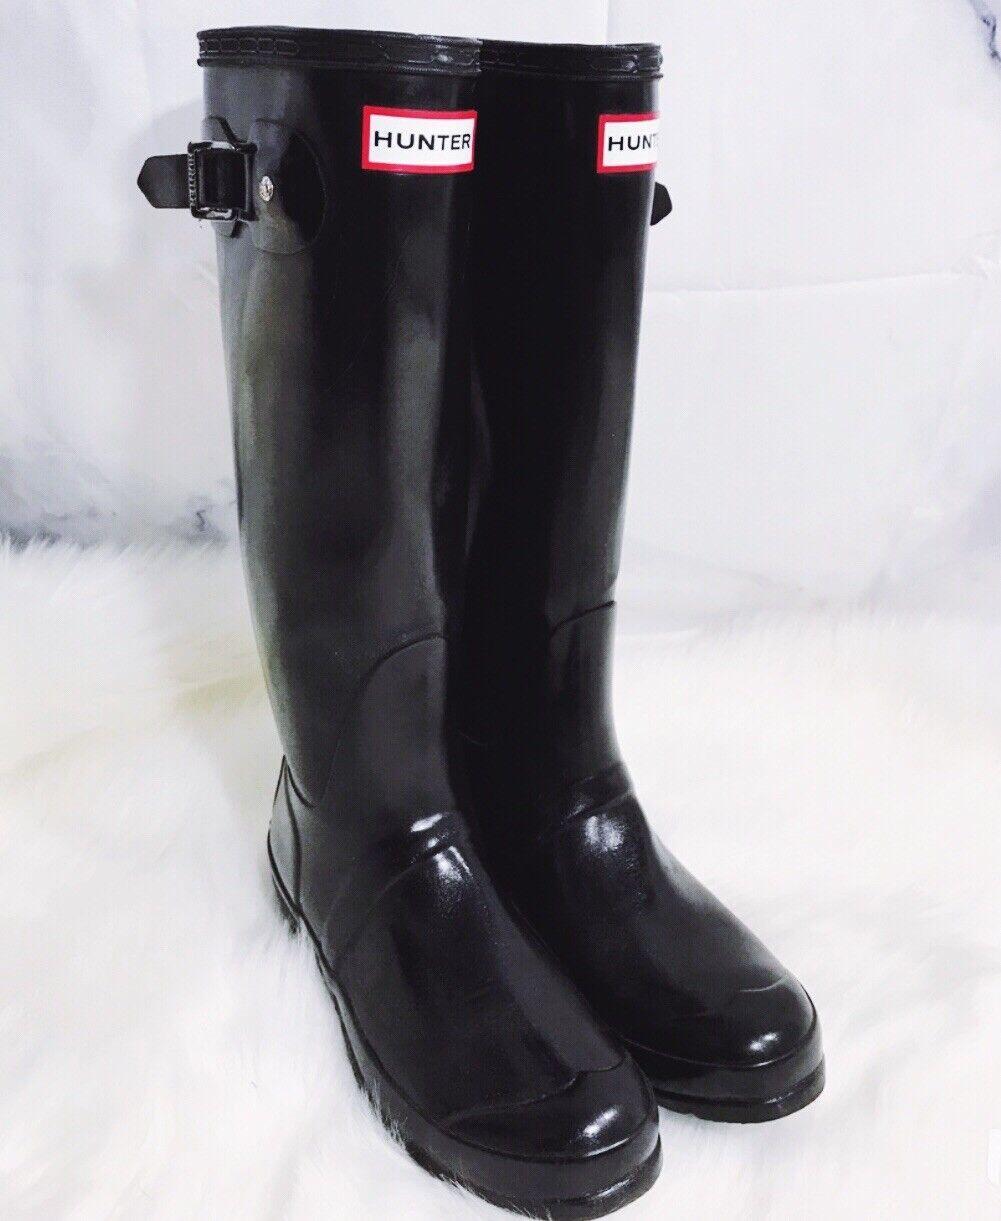 Hunter Original Tall Mujer Hasta Hasta Hasta la Rodilla Alta De Goma Para Lluvia botas Tamaño 7 c8fbca